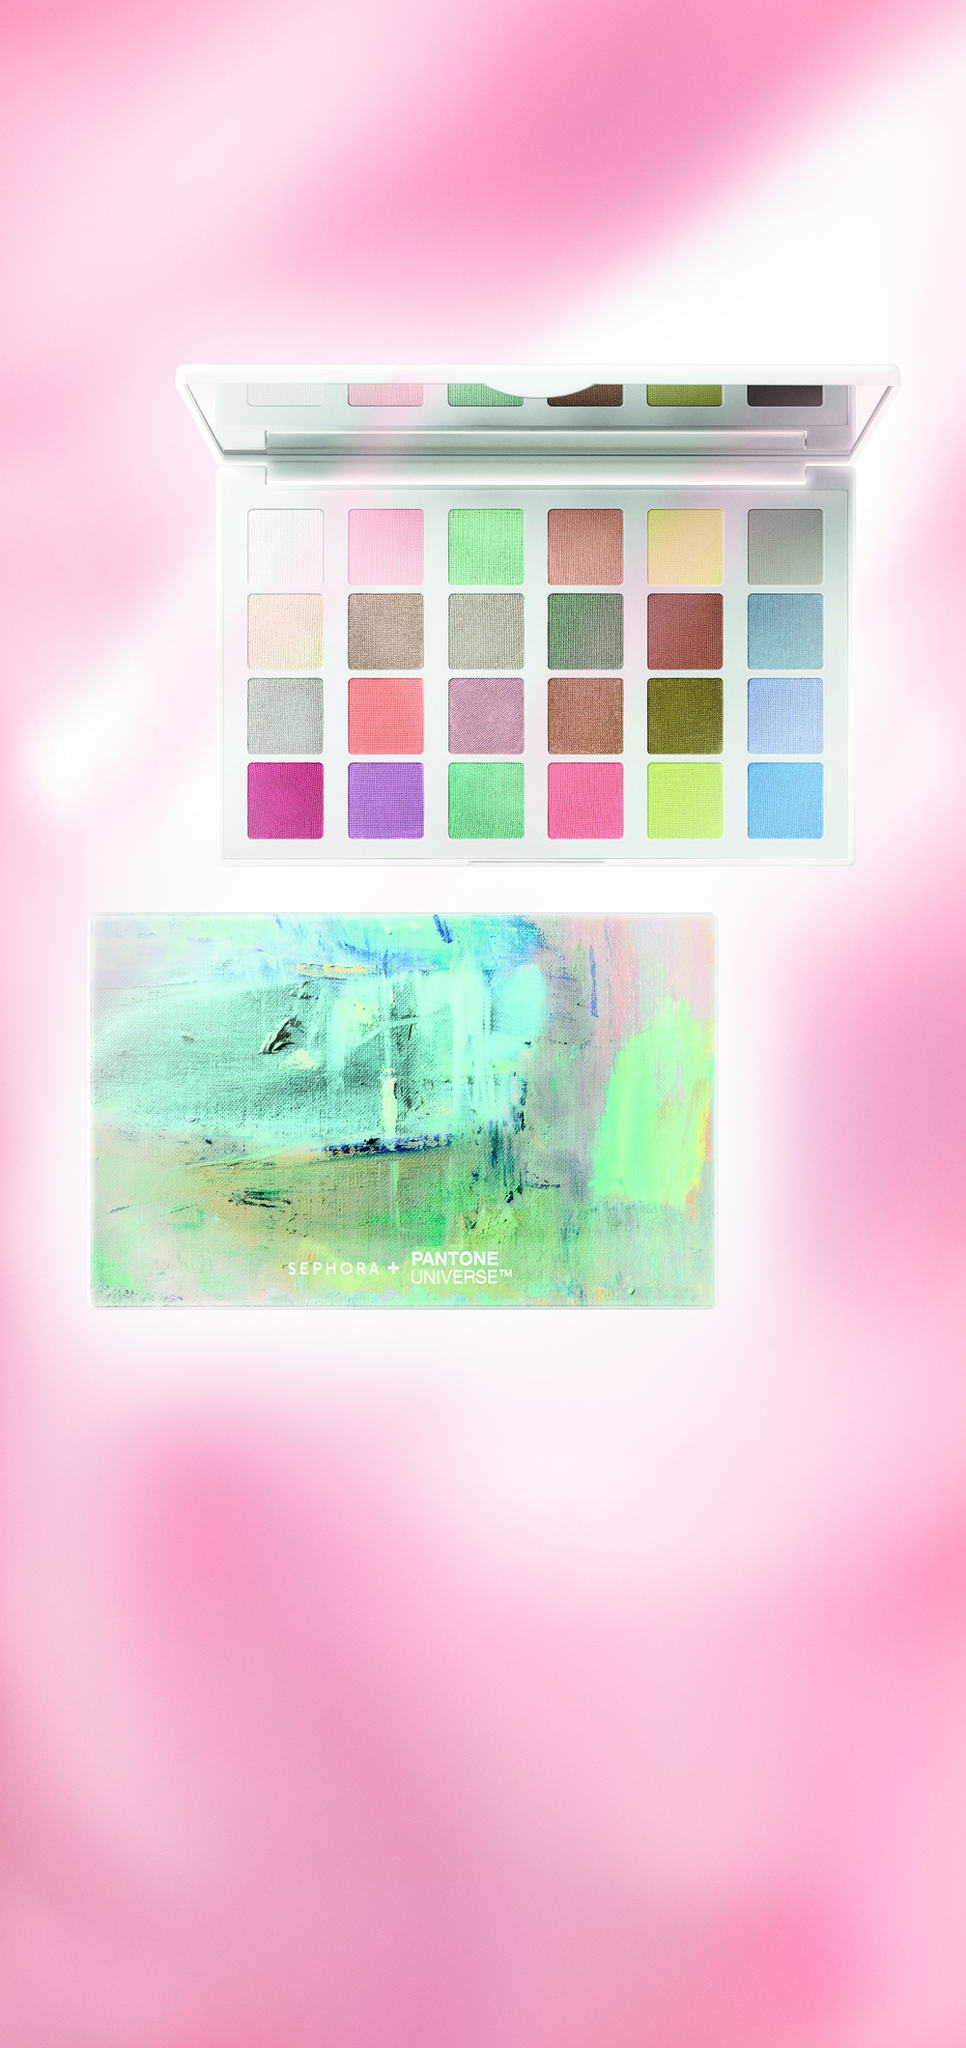 Credit_SEPHORA + PANTONE UNIVERSE Color of the Year 2016 Eye Palette.jpg